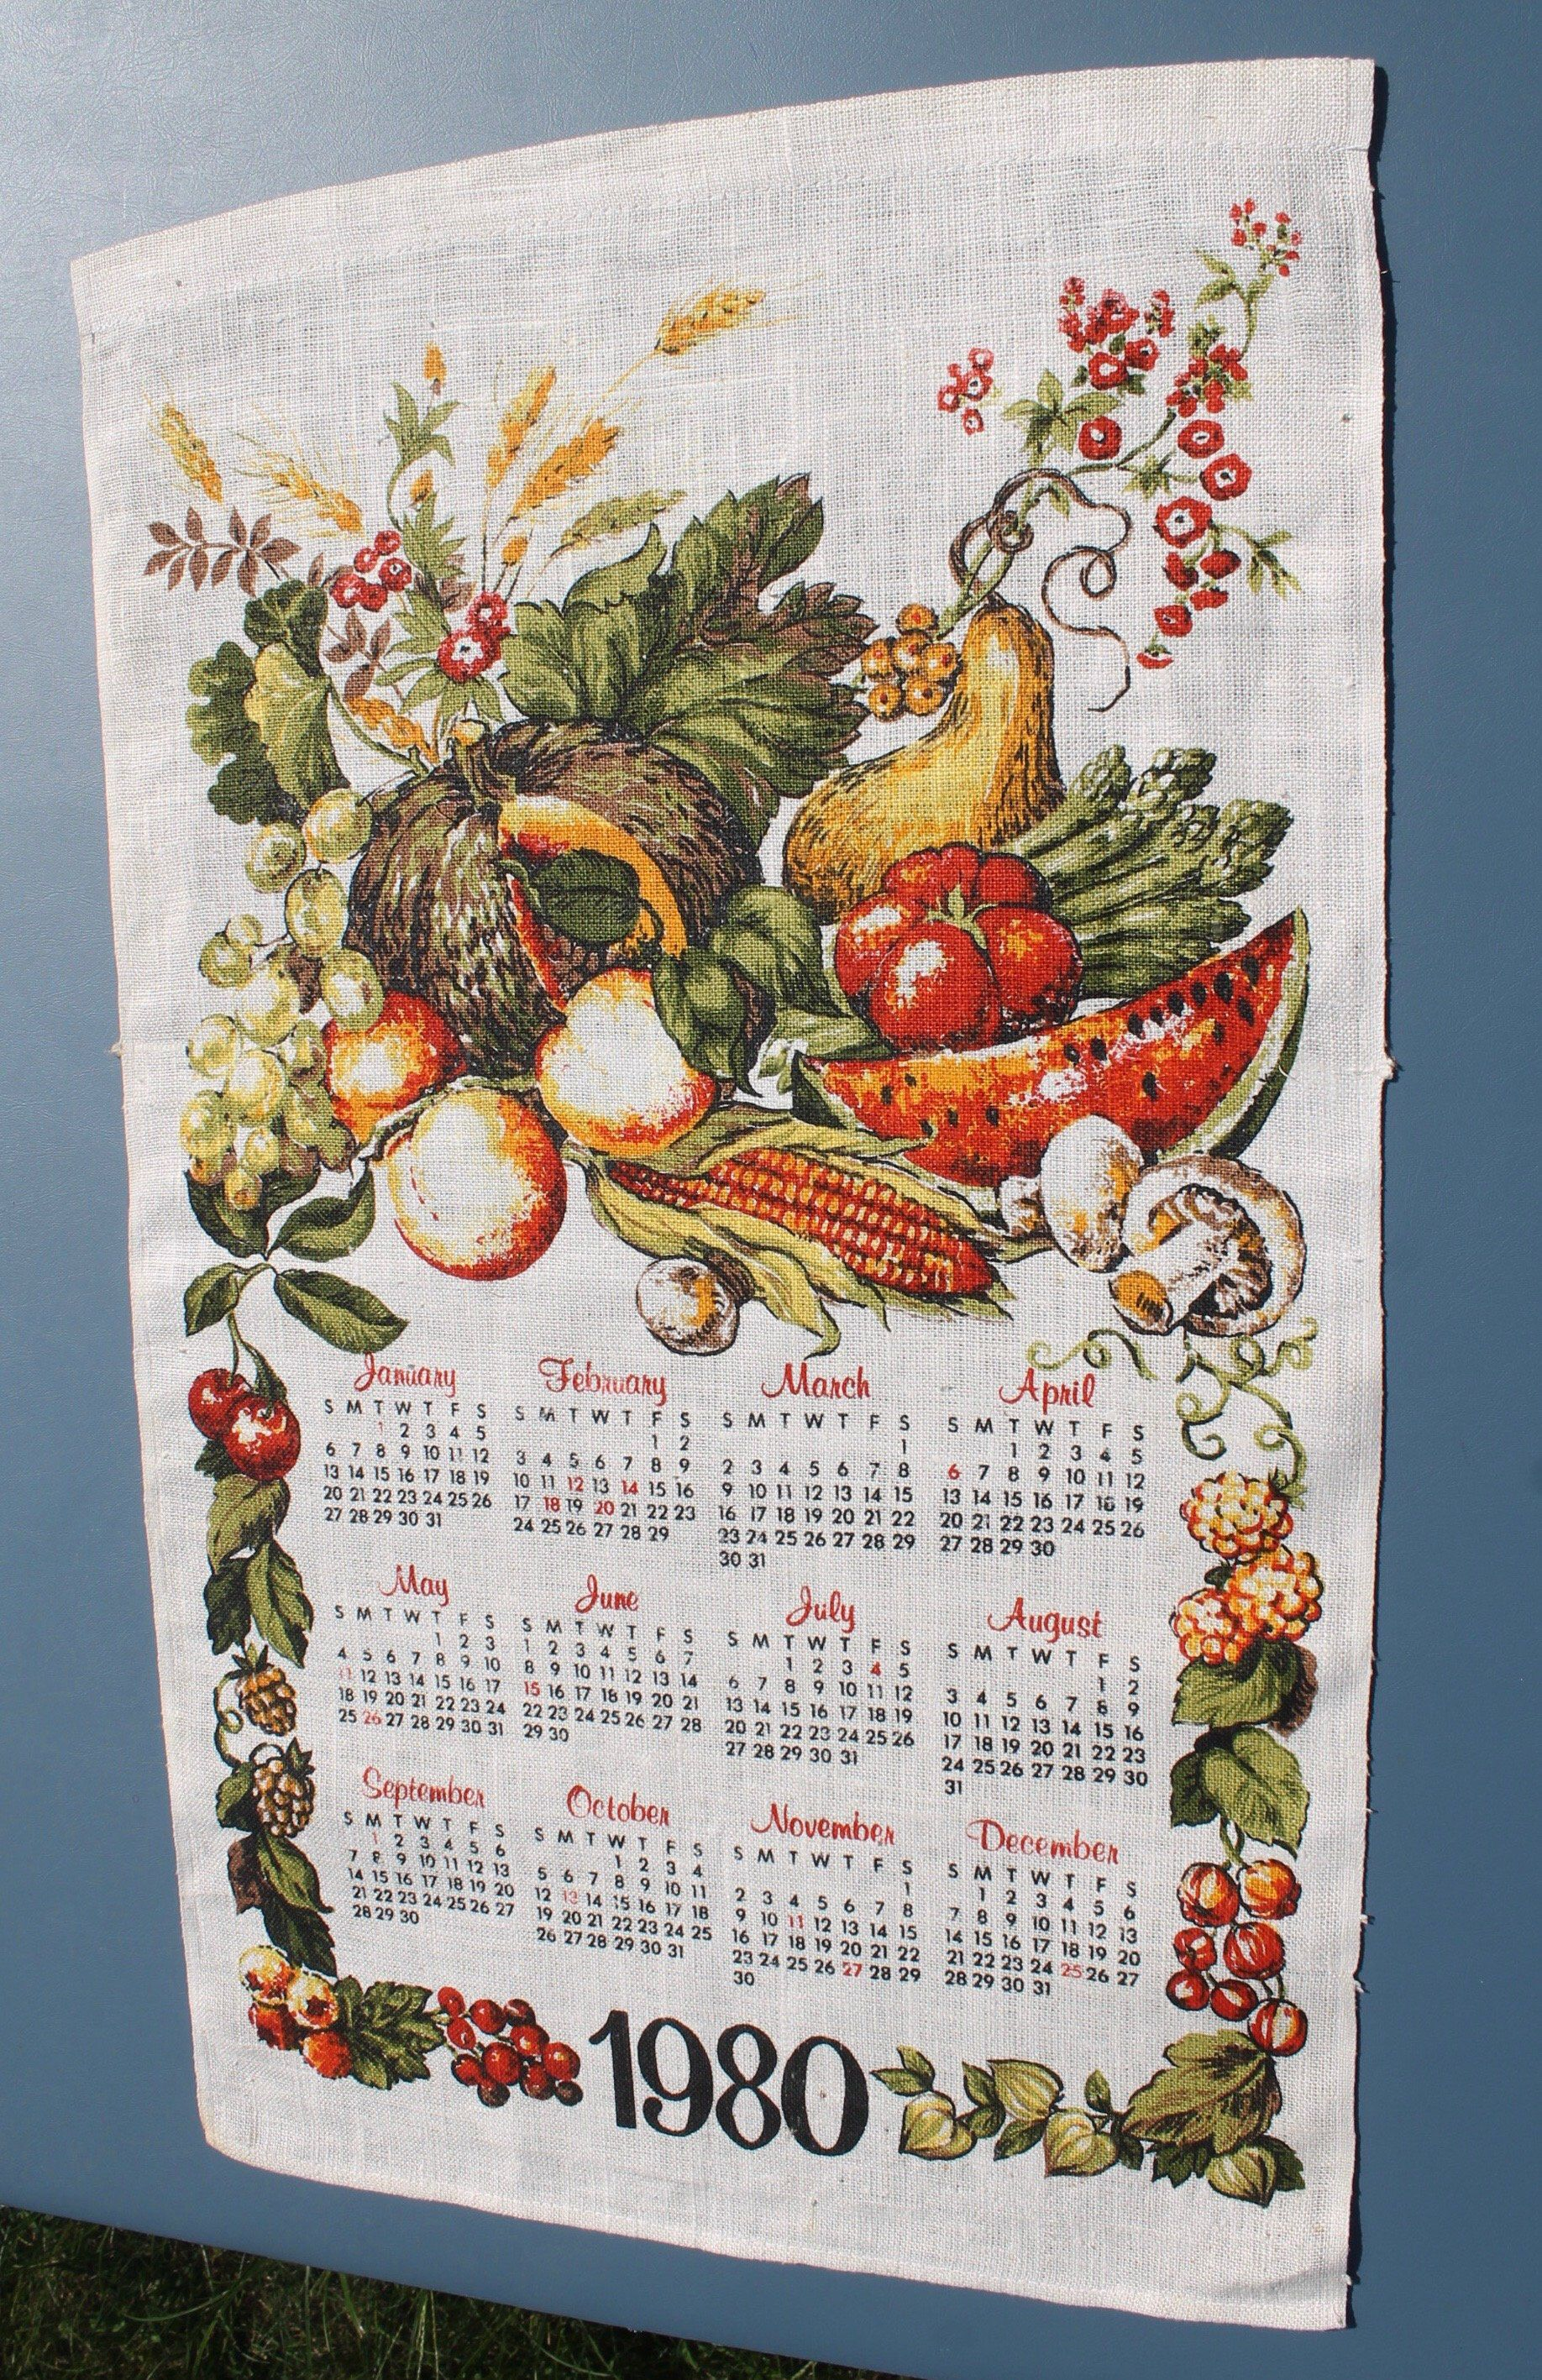 Hamstead Vintage Printed Linen Tea Towel  Dish Towel  Wall Hanging OLD BULL and BUSH London